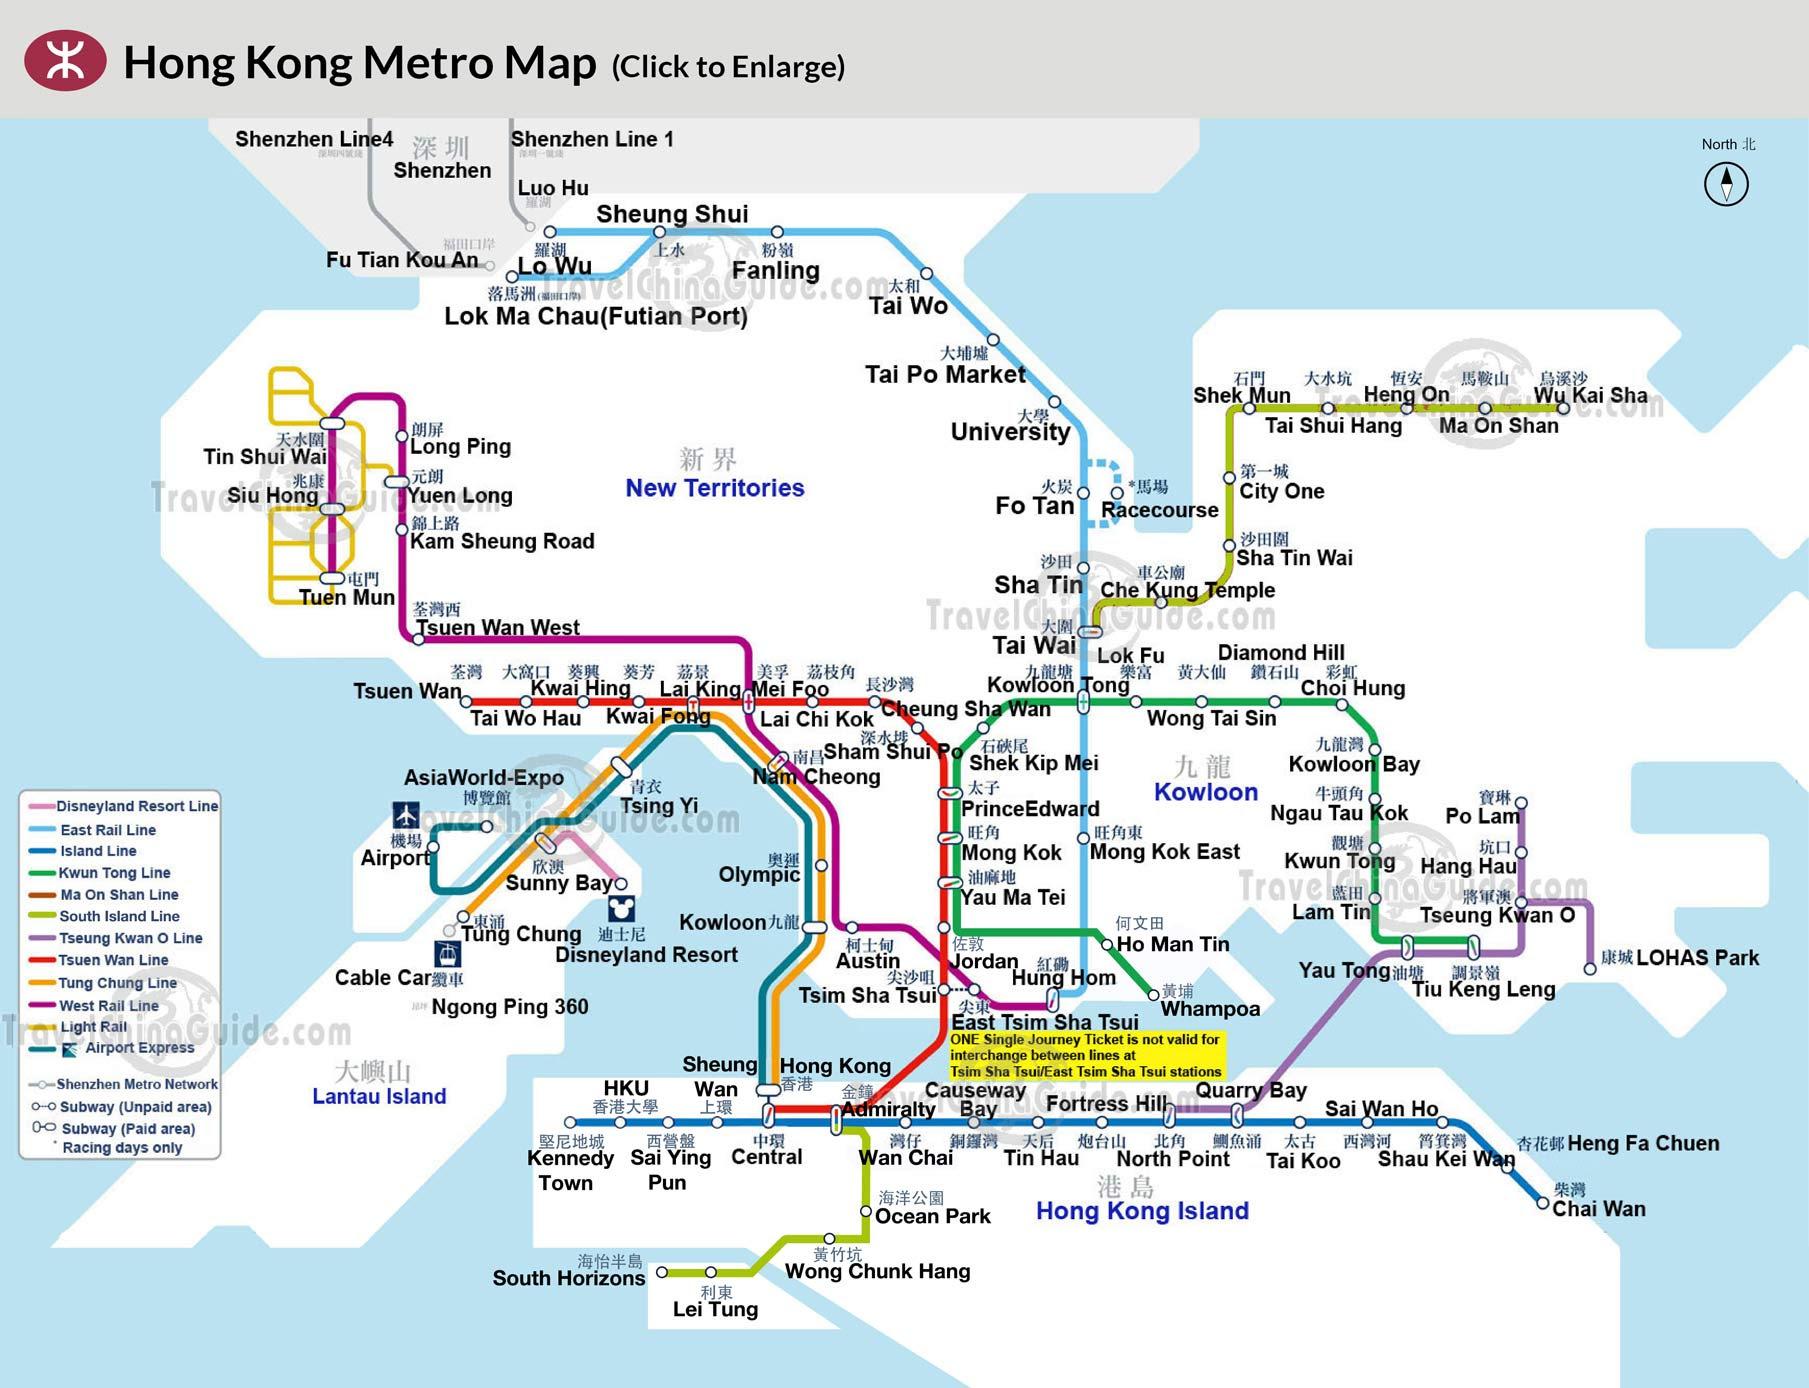 http://www.travelchinaguide.com/images/map/hongkong/metro.jpg